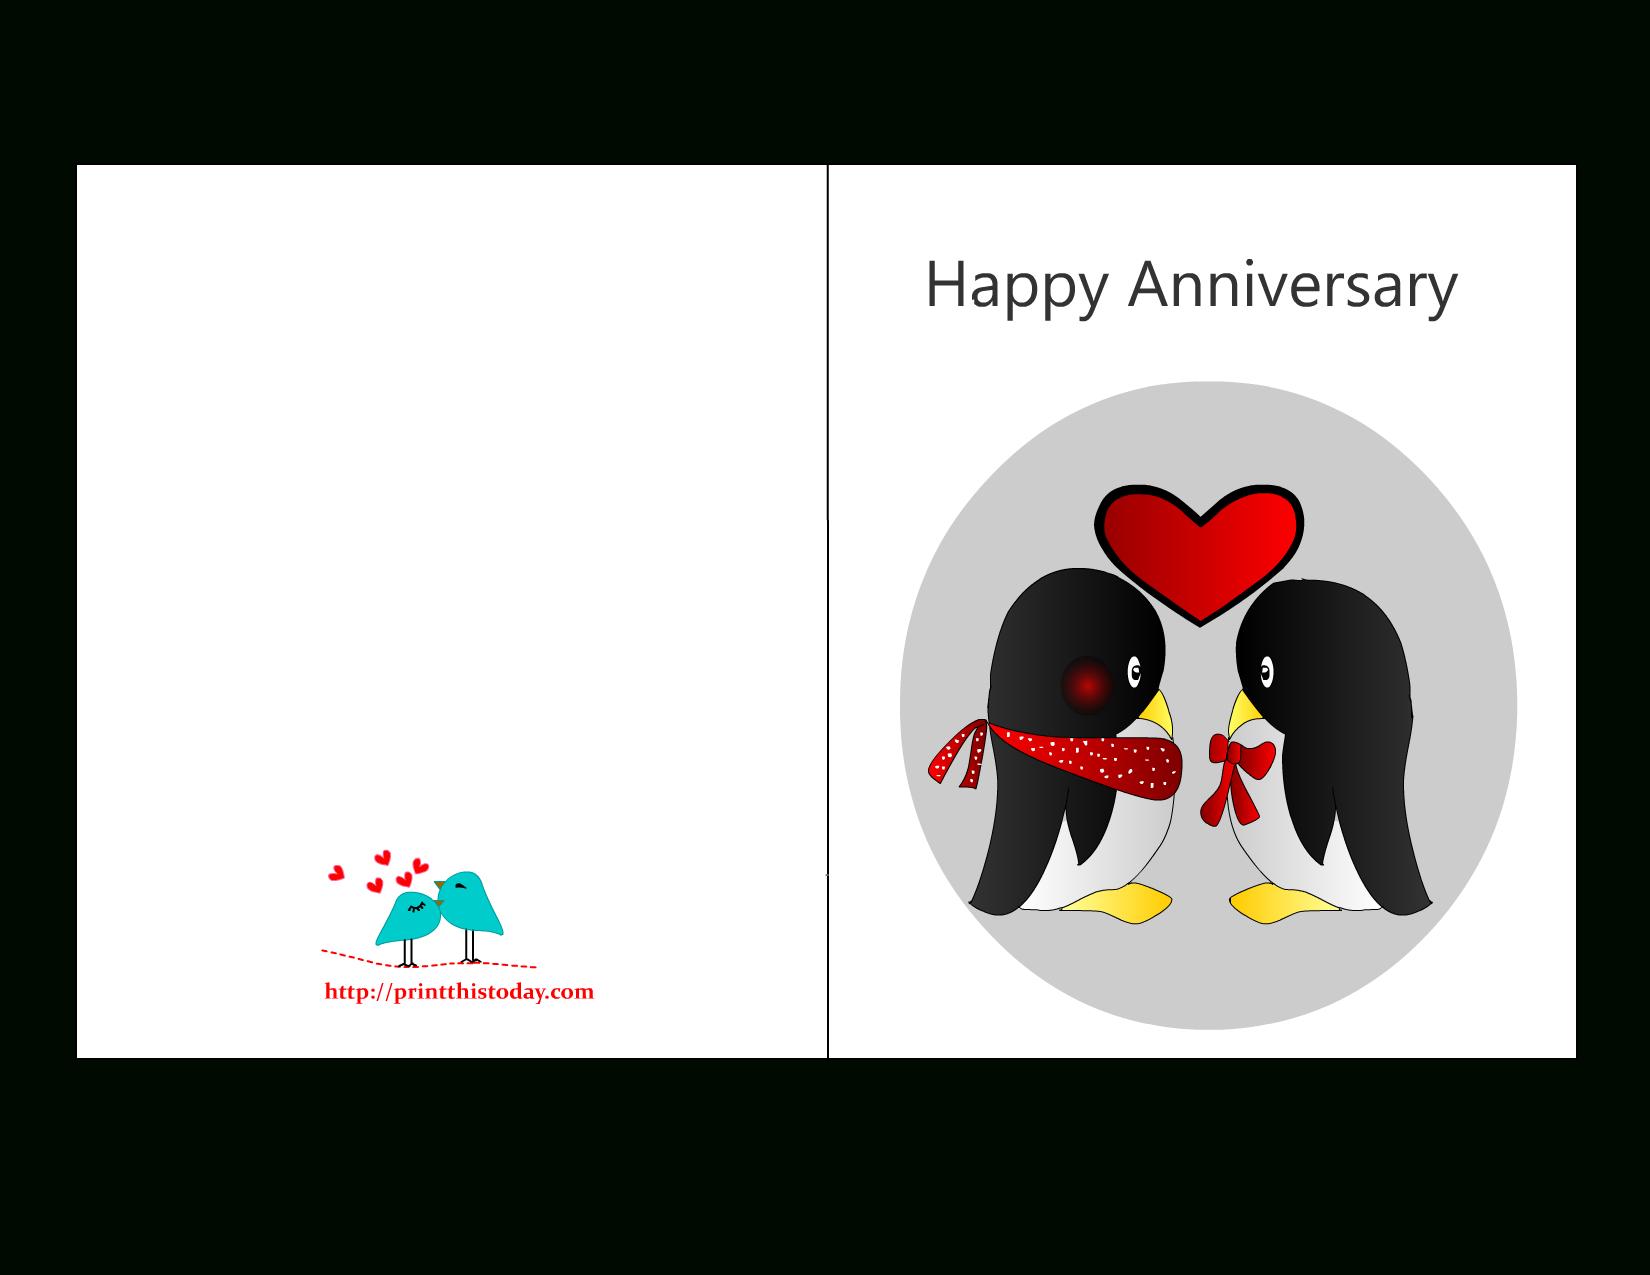 Anniversary Card Templates 12 Free - Anniversary Card Regarding Word Anniversary Card Template